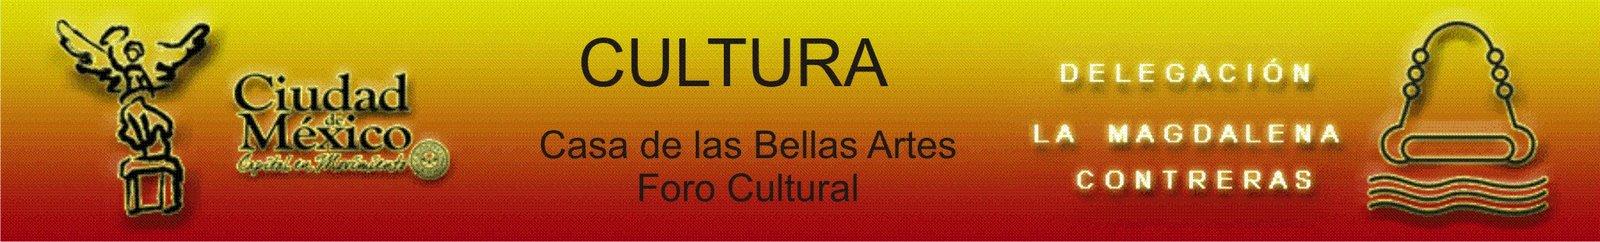 Cultura en la Magdalena Contreras